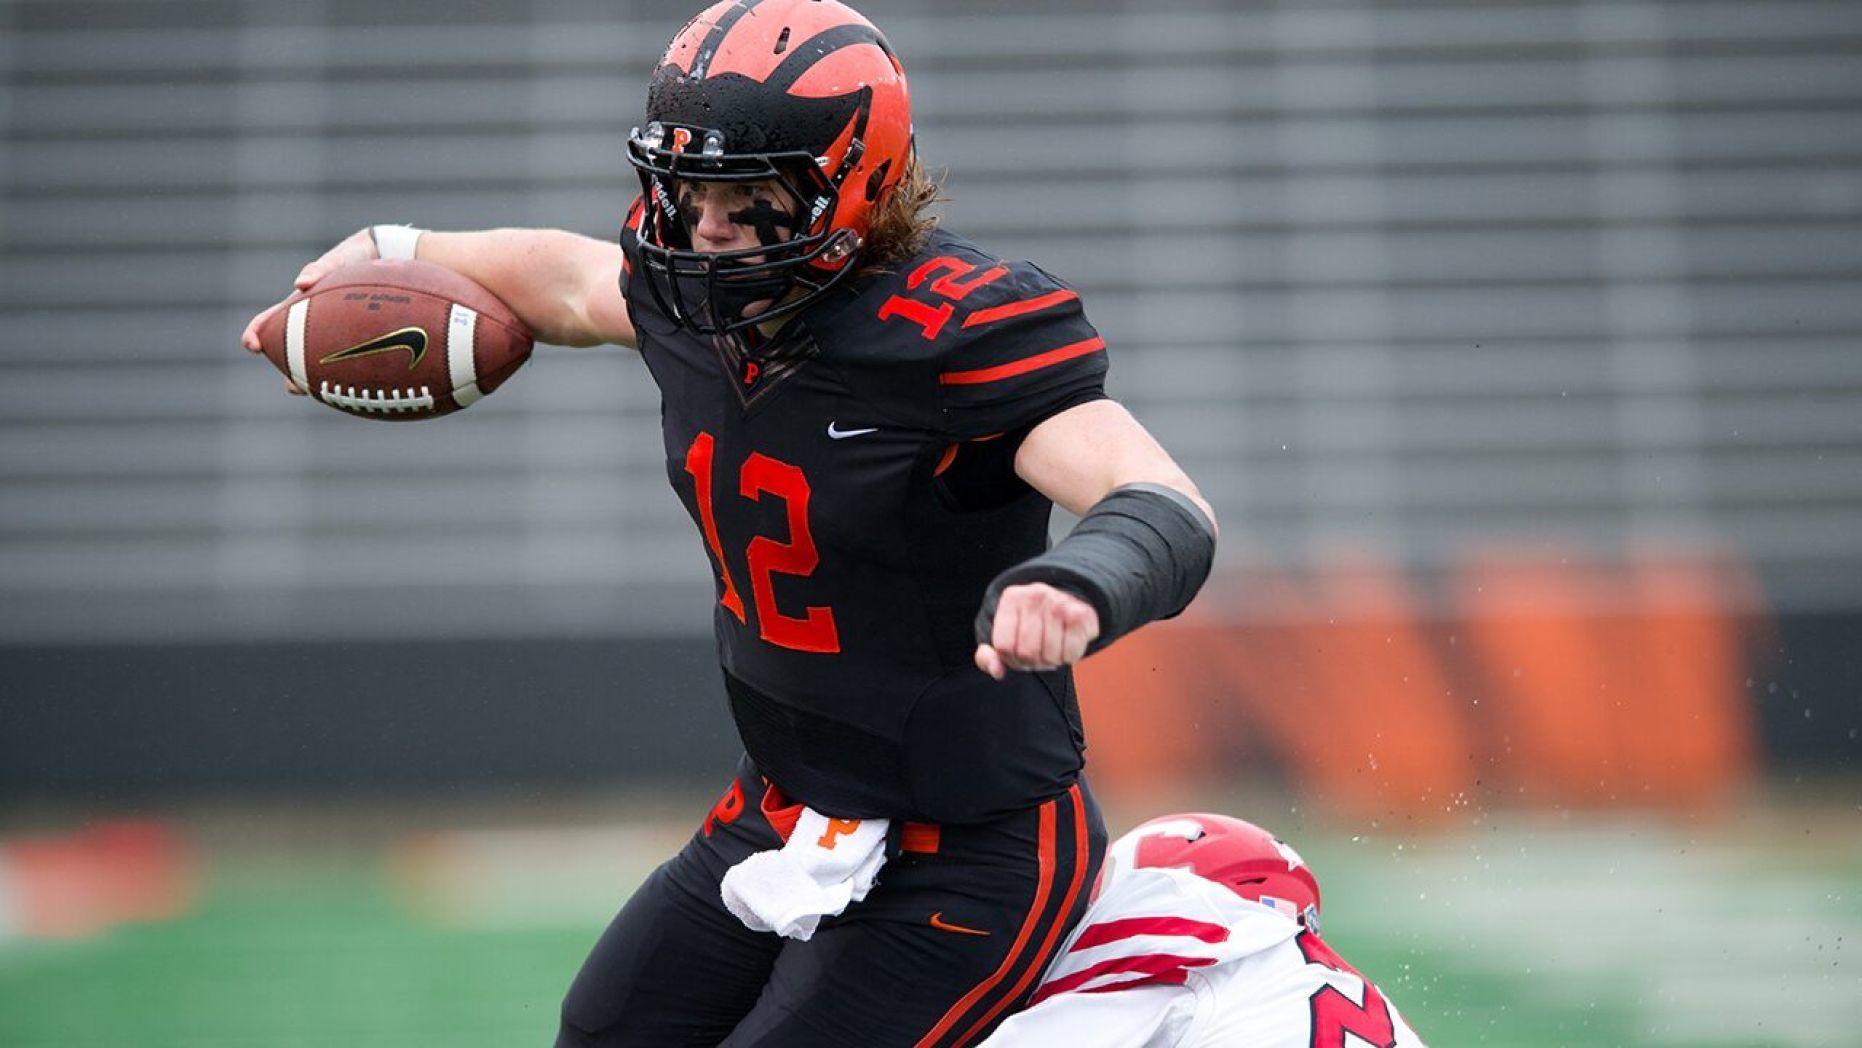 Ivy League football star eschewing stability for longshot